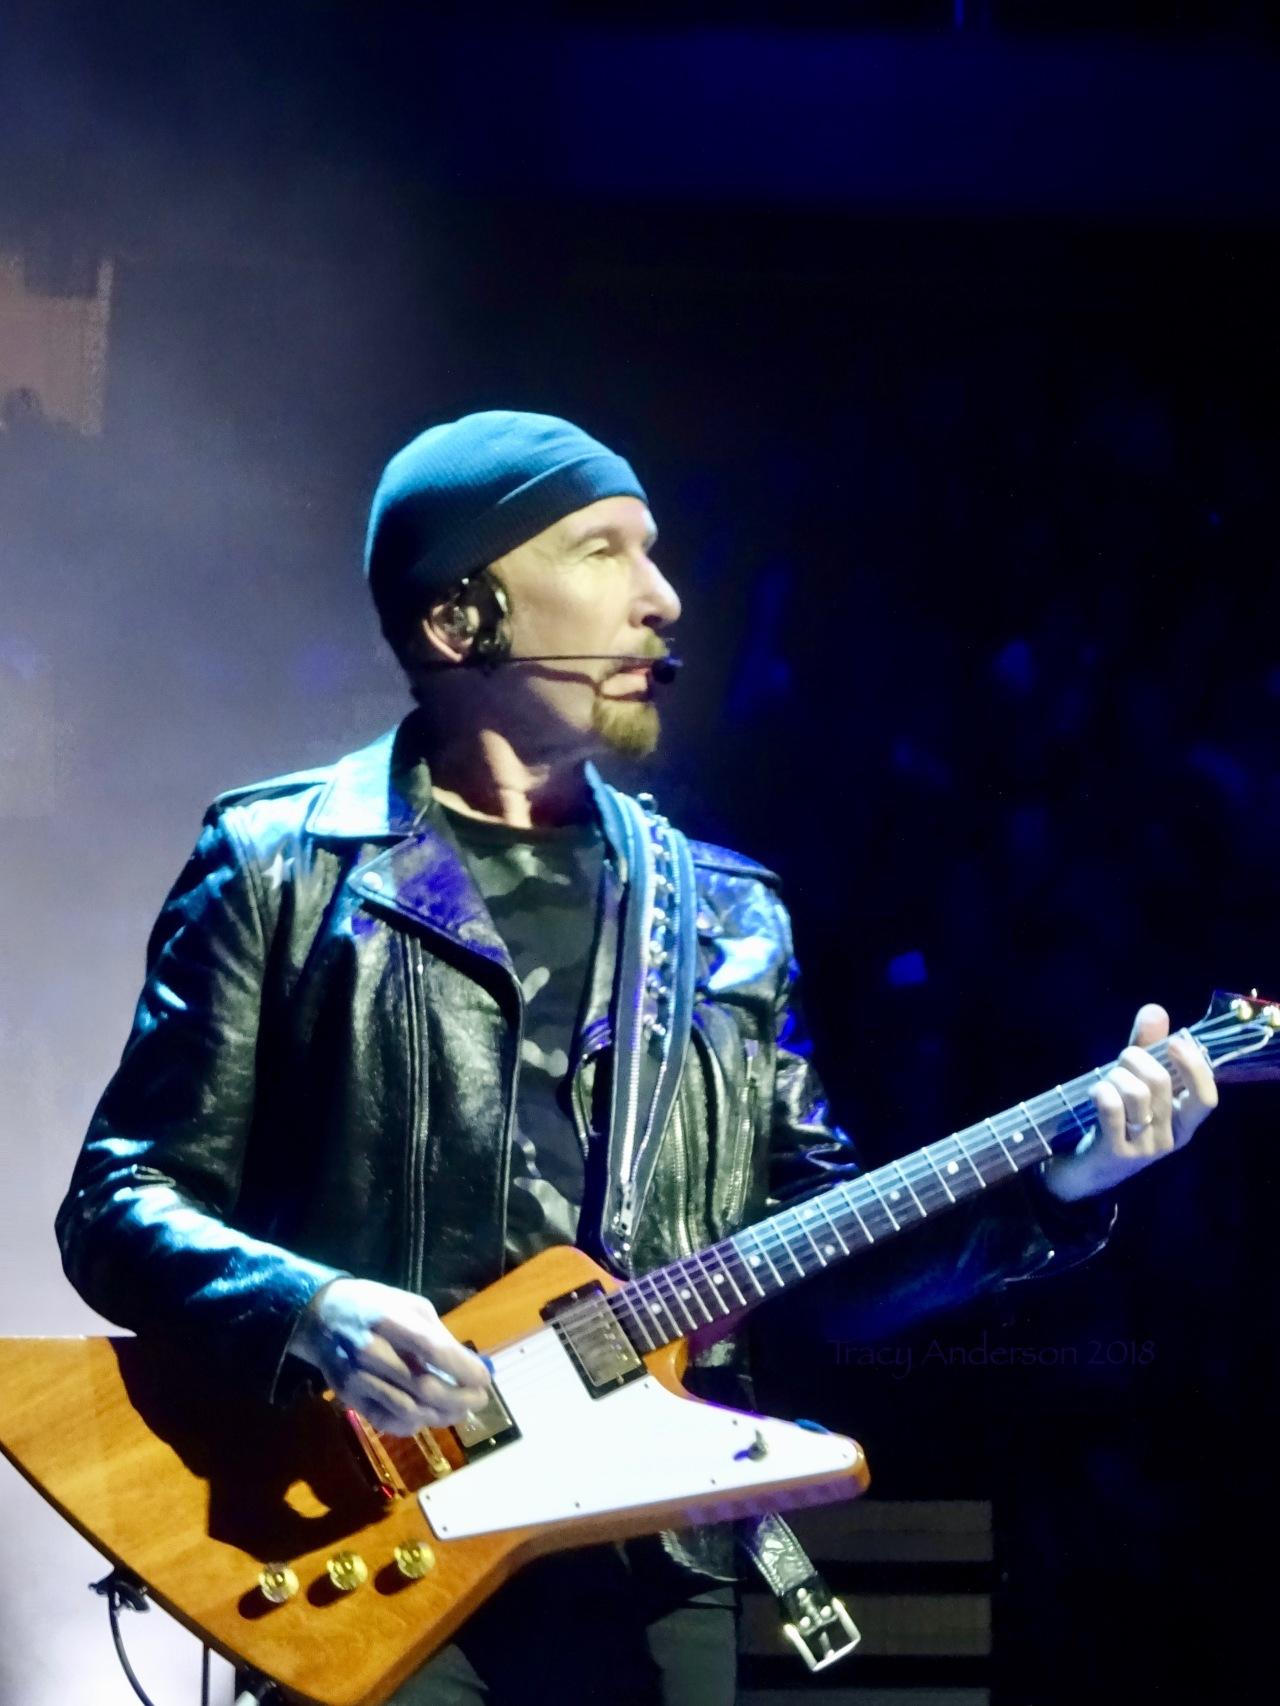 The Edge with Gibson Guitar U2 eiTour Las Vegas May 11 2018